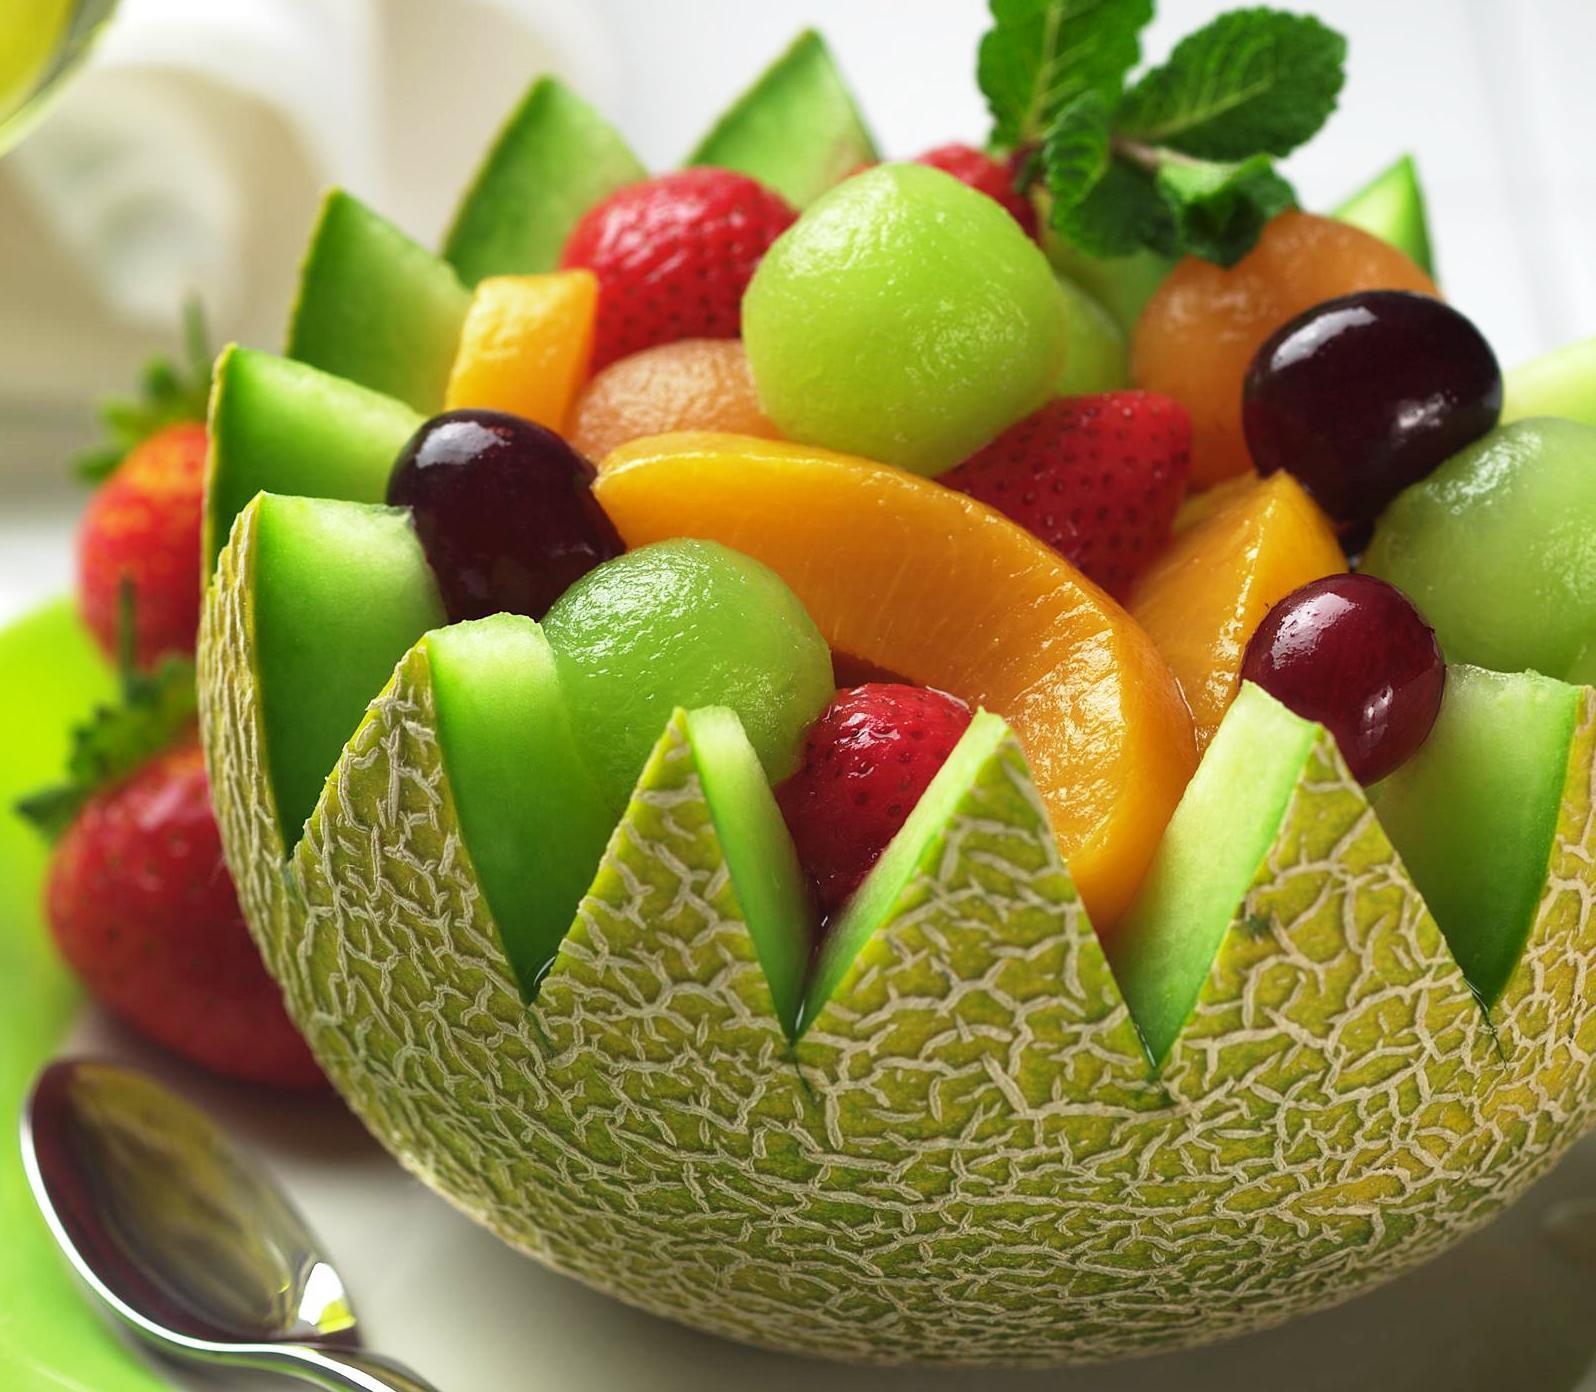 картинки для нарезки фруктов с рецептами сверху между